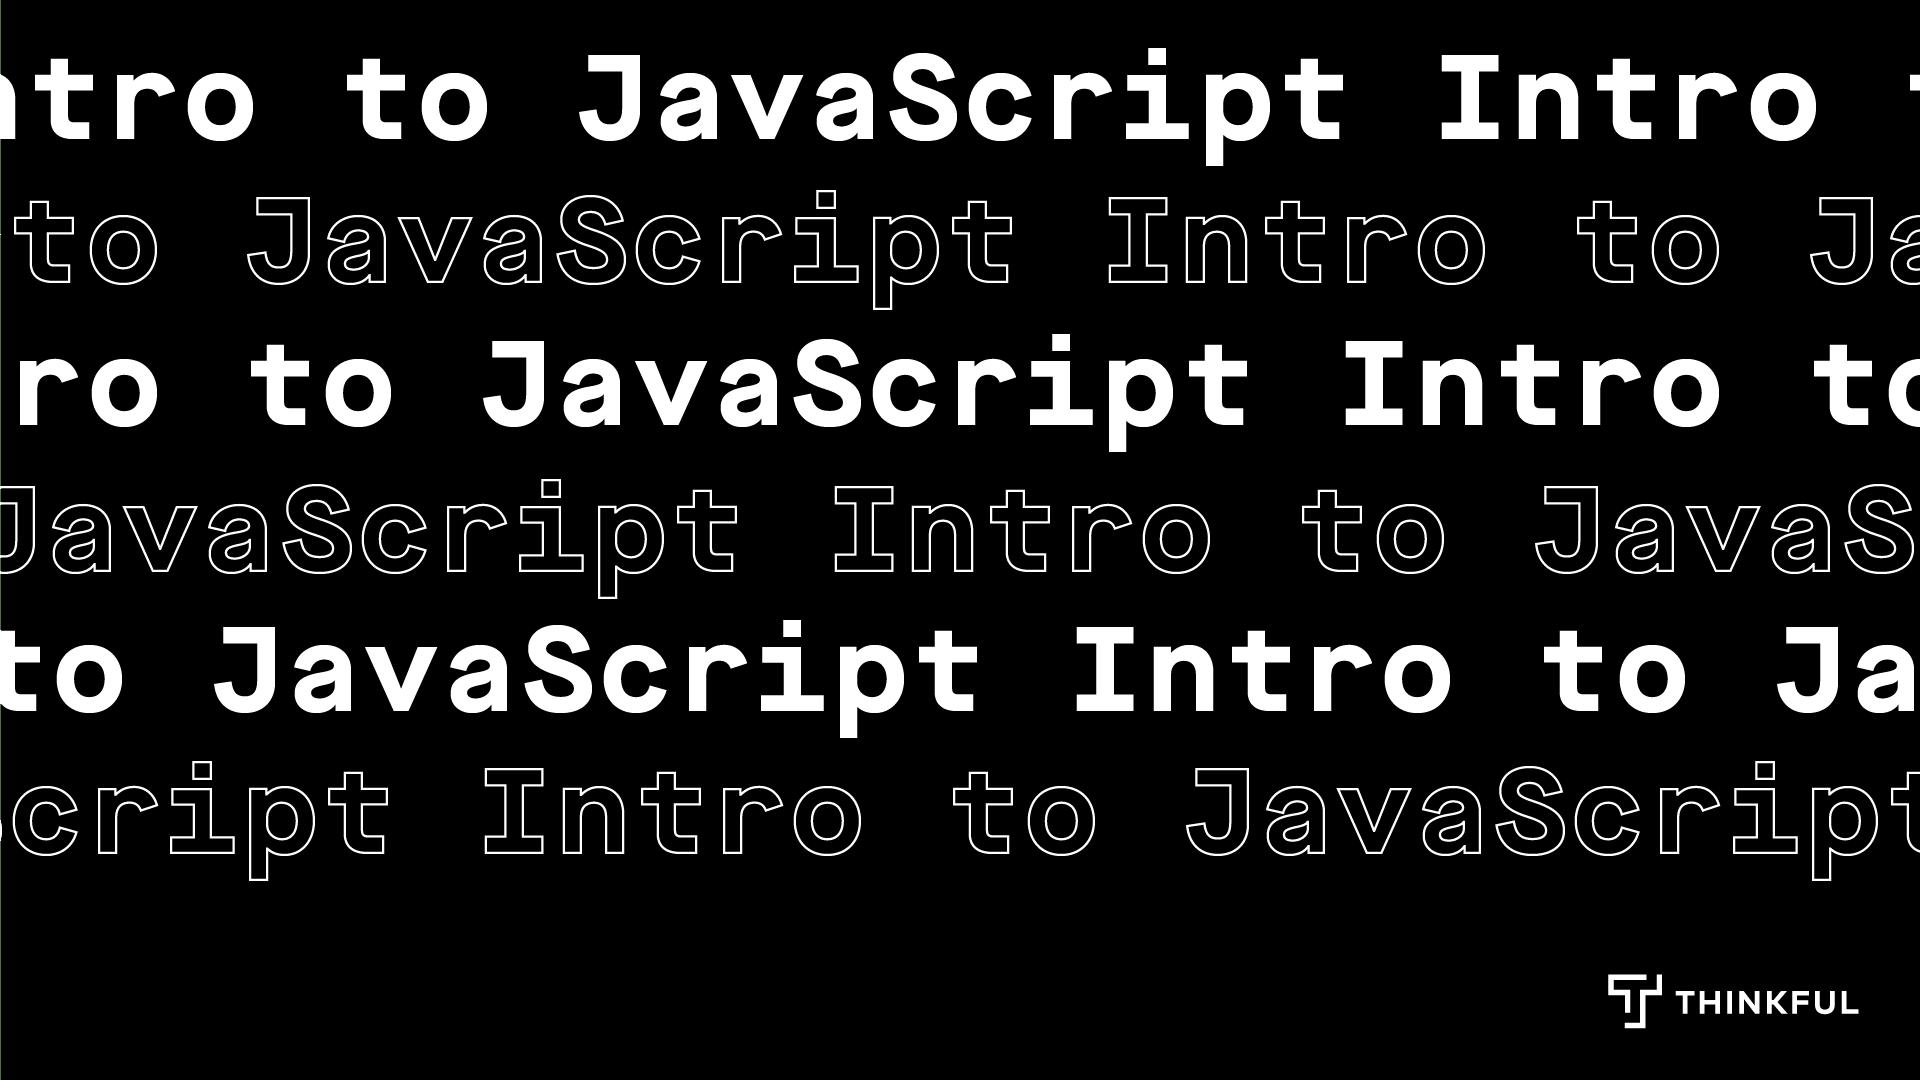 Intro to JavaScript: Build a Virtual Pet